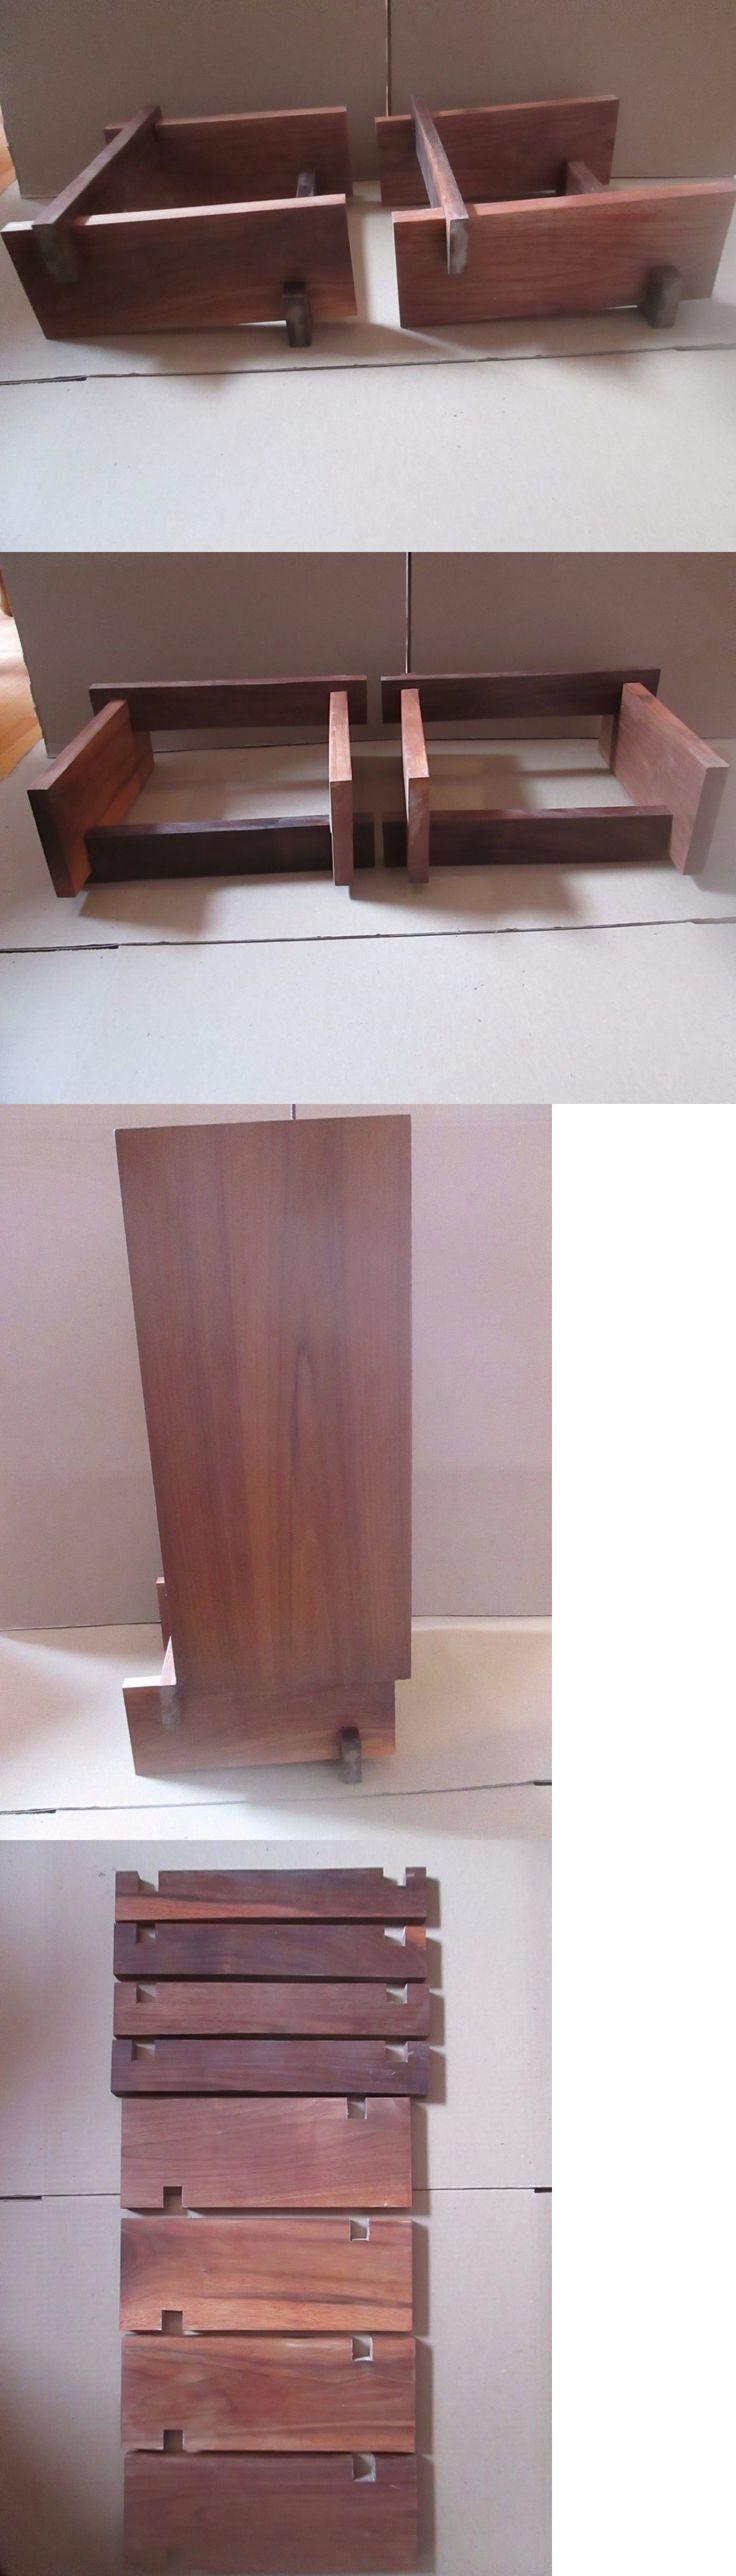 Vintage Speakers: Back-Tilted Solid Walnut Stands For Large Speakers -> BUY IT NOW ONLY: $54.99 on eBay!